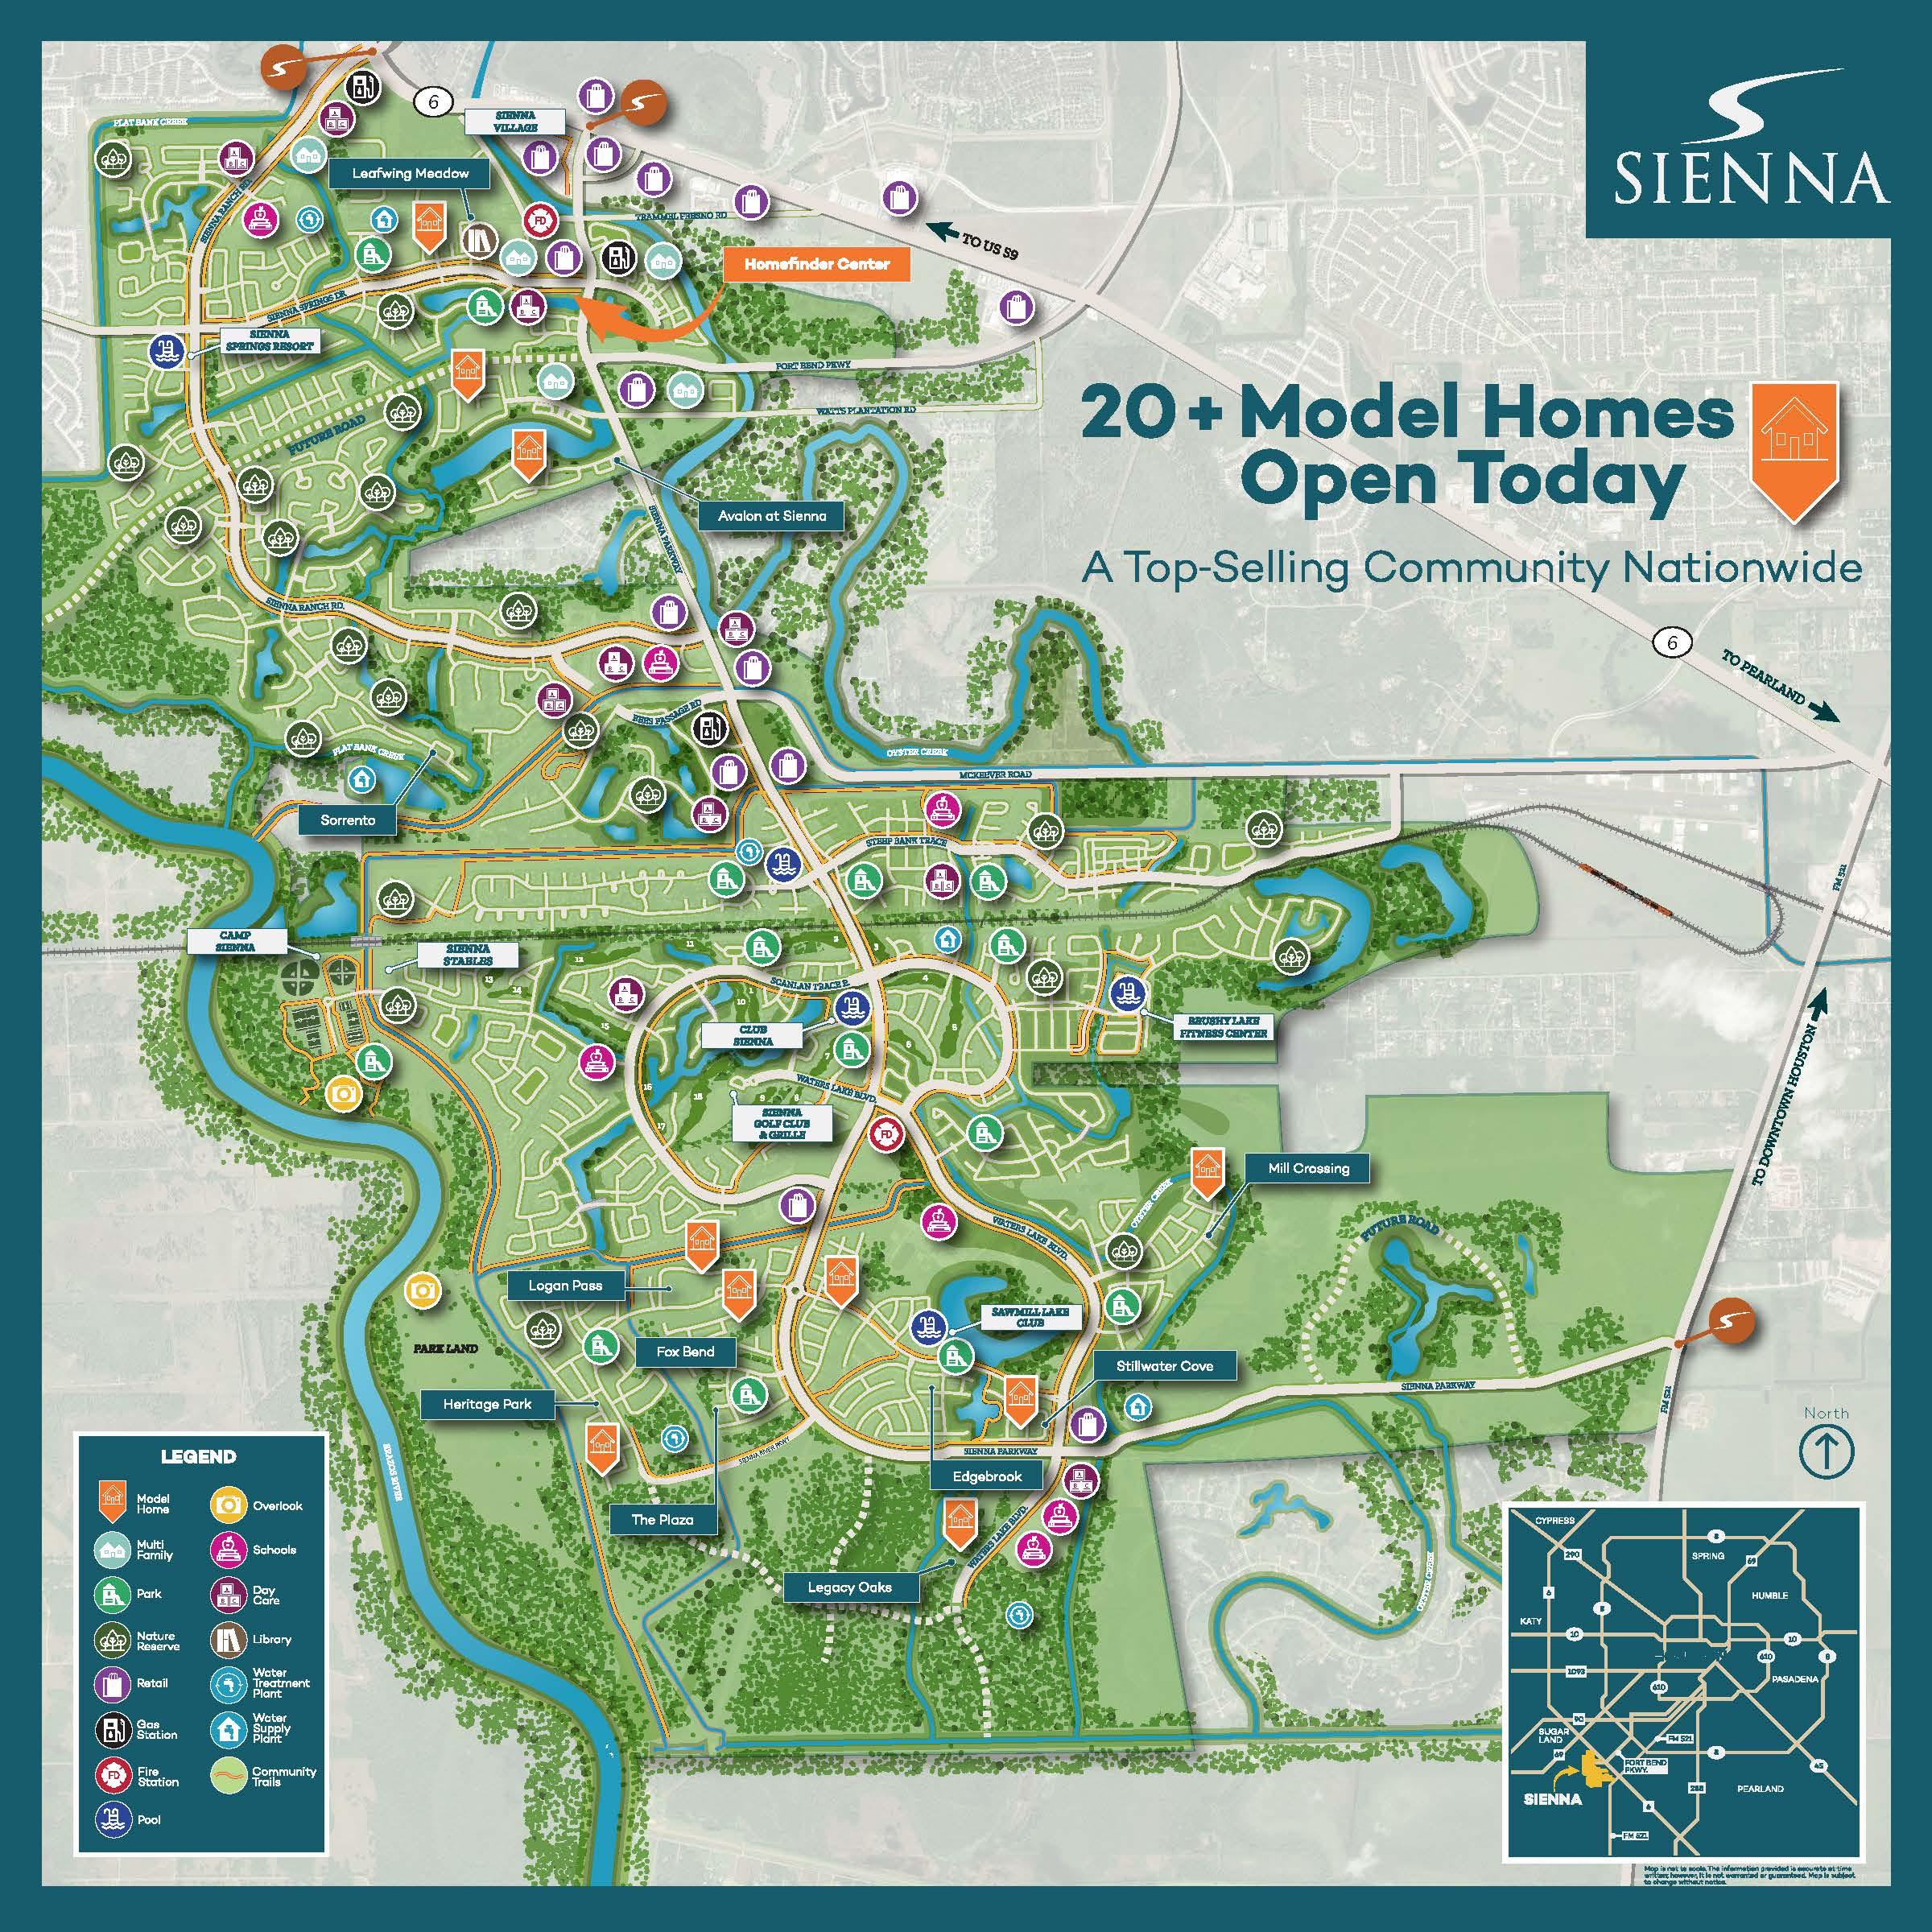 Sienna Plantation Community Marketing Map  TBG Partners - Missouri City, TX  Lead design for development of a community map for Johnson Development Corporation and the Sienna Plantation Marketing team.